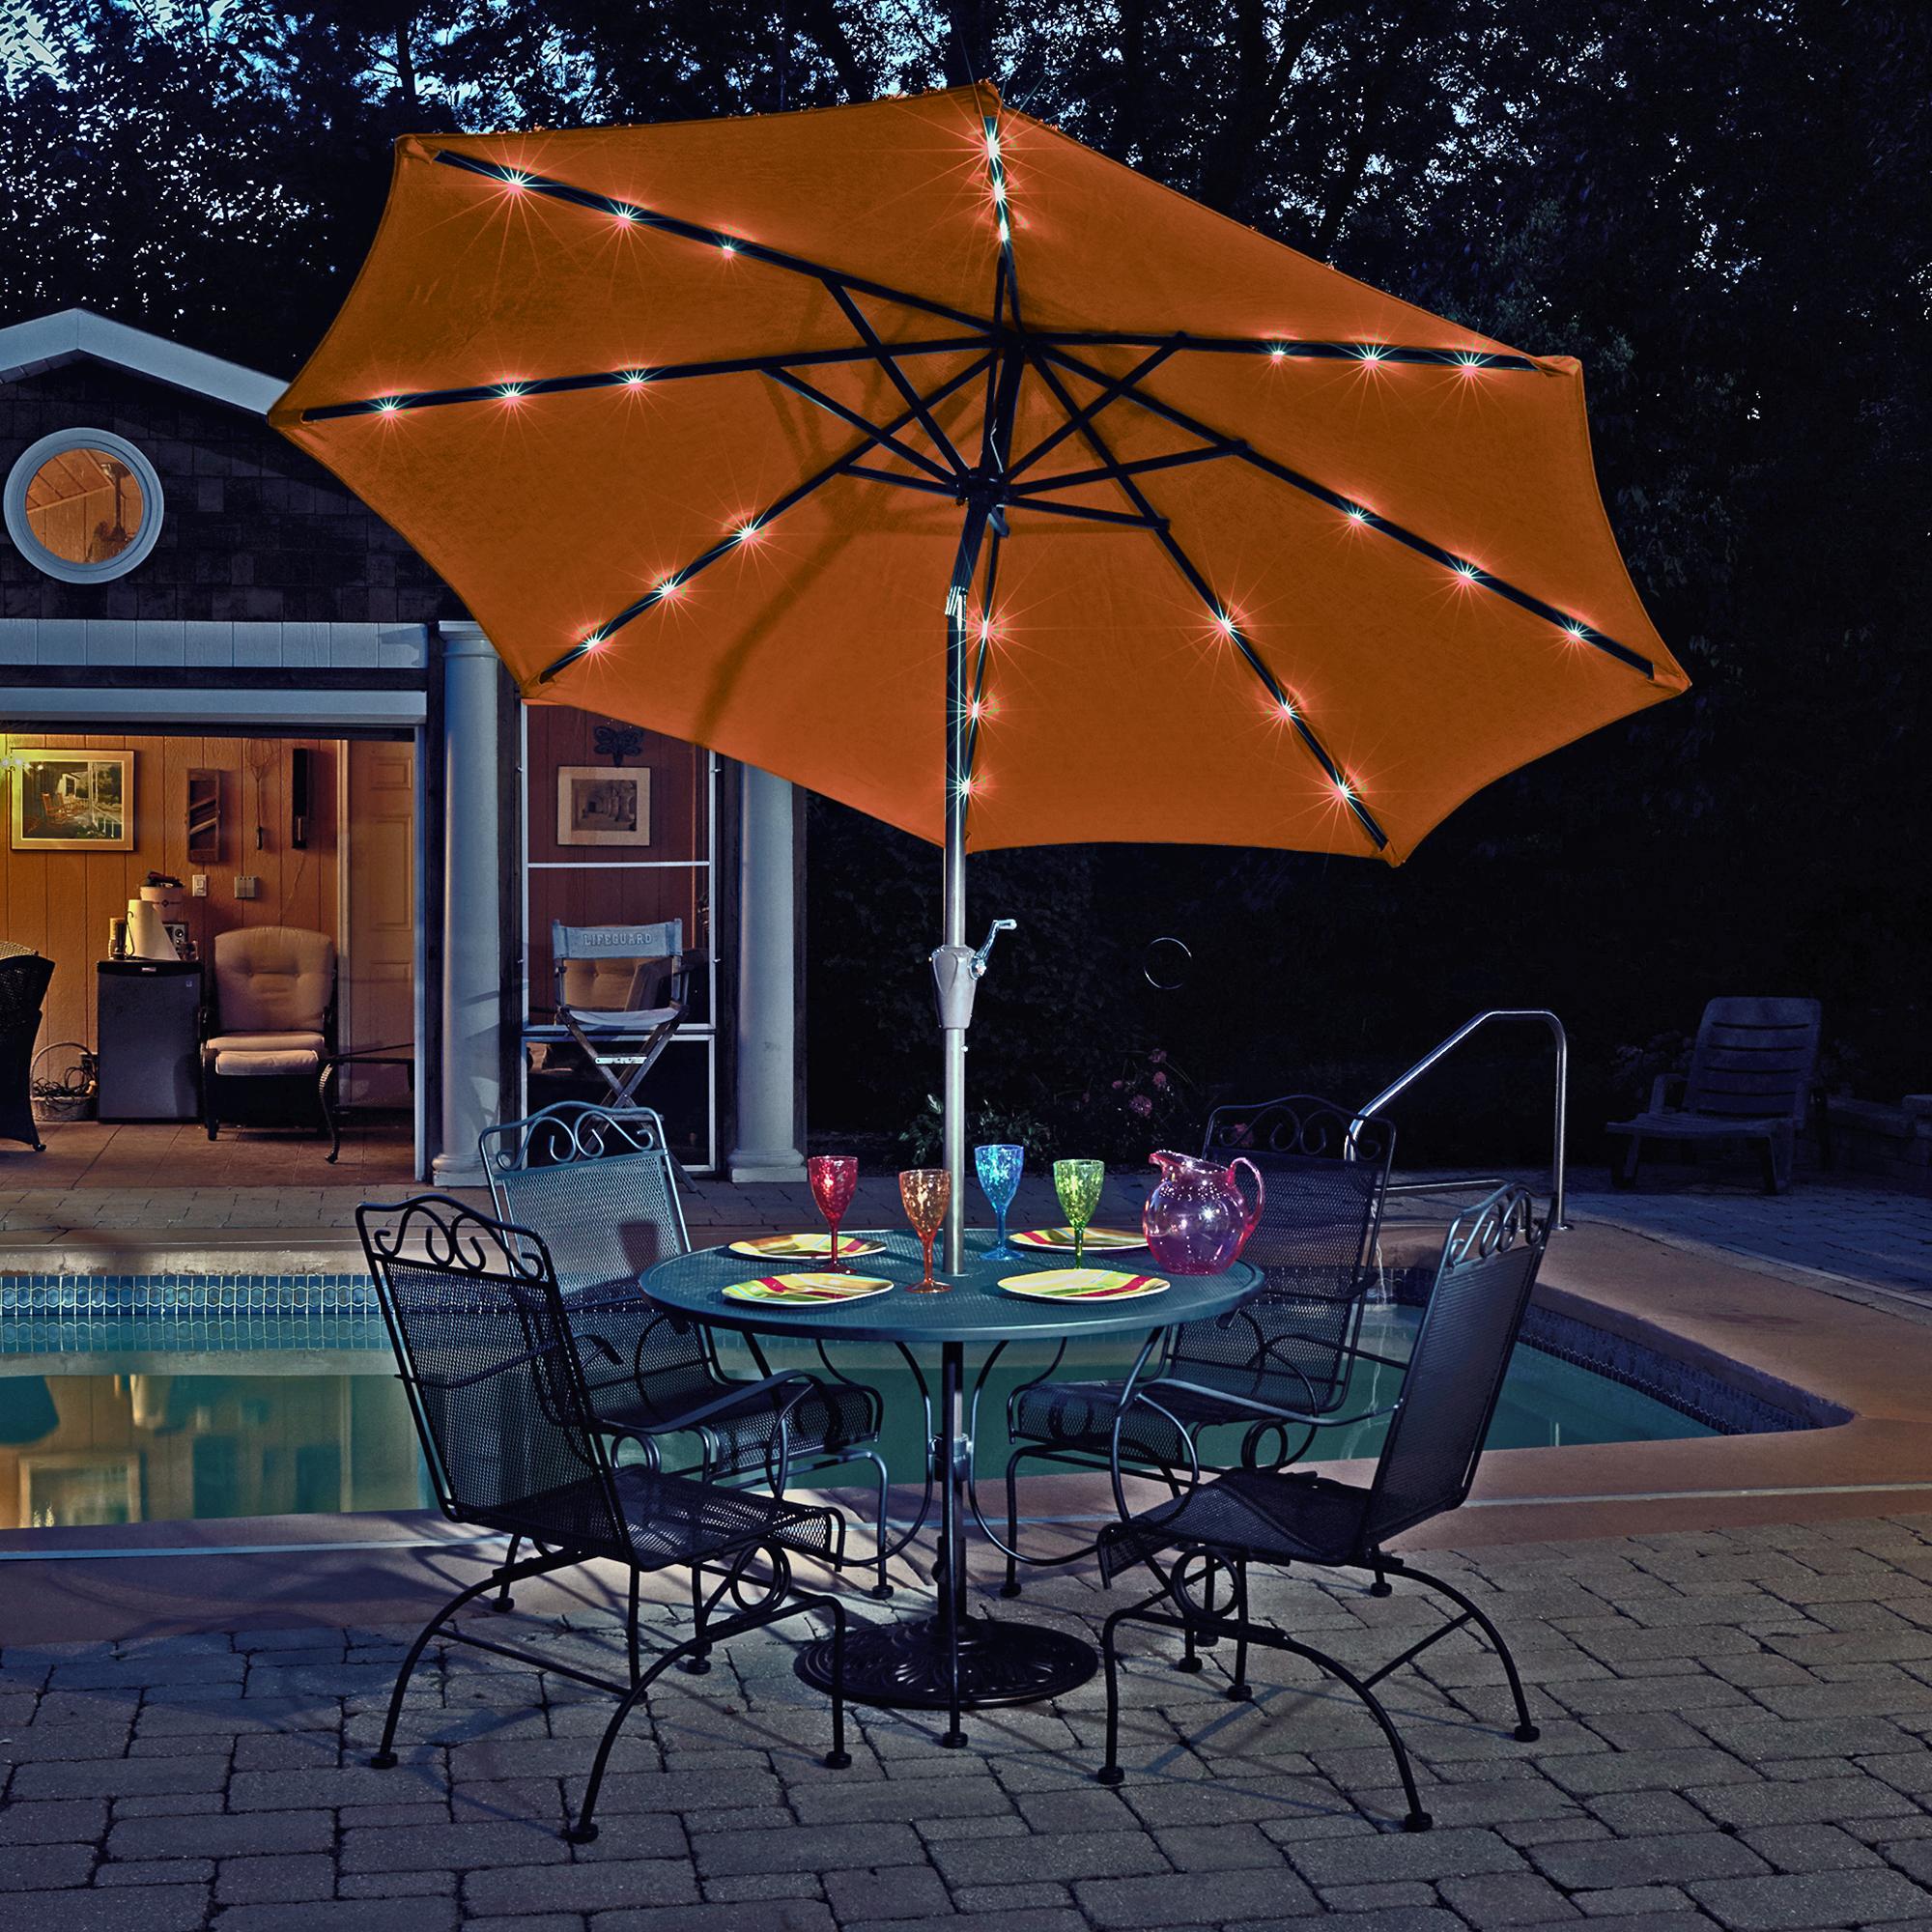 Genial Island Umbrella Mirage Fiesta 9 Ft Market Solar LED Auto Tilt Patio Umbrella  In Terra Cotta Olefin